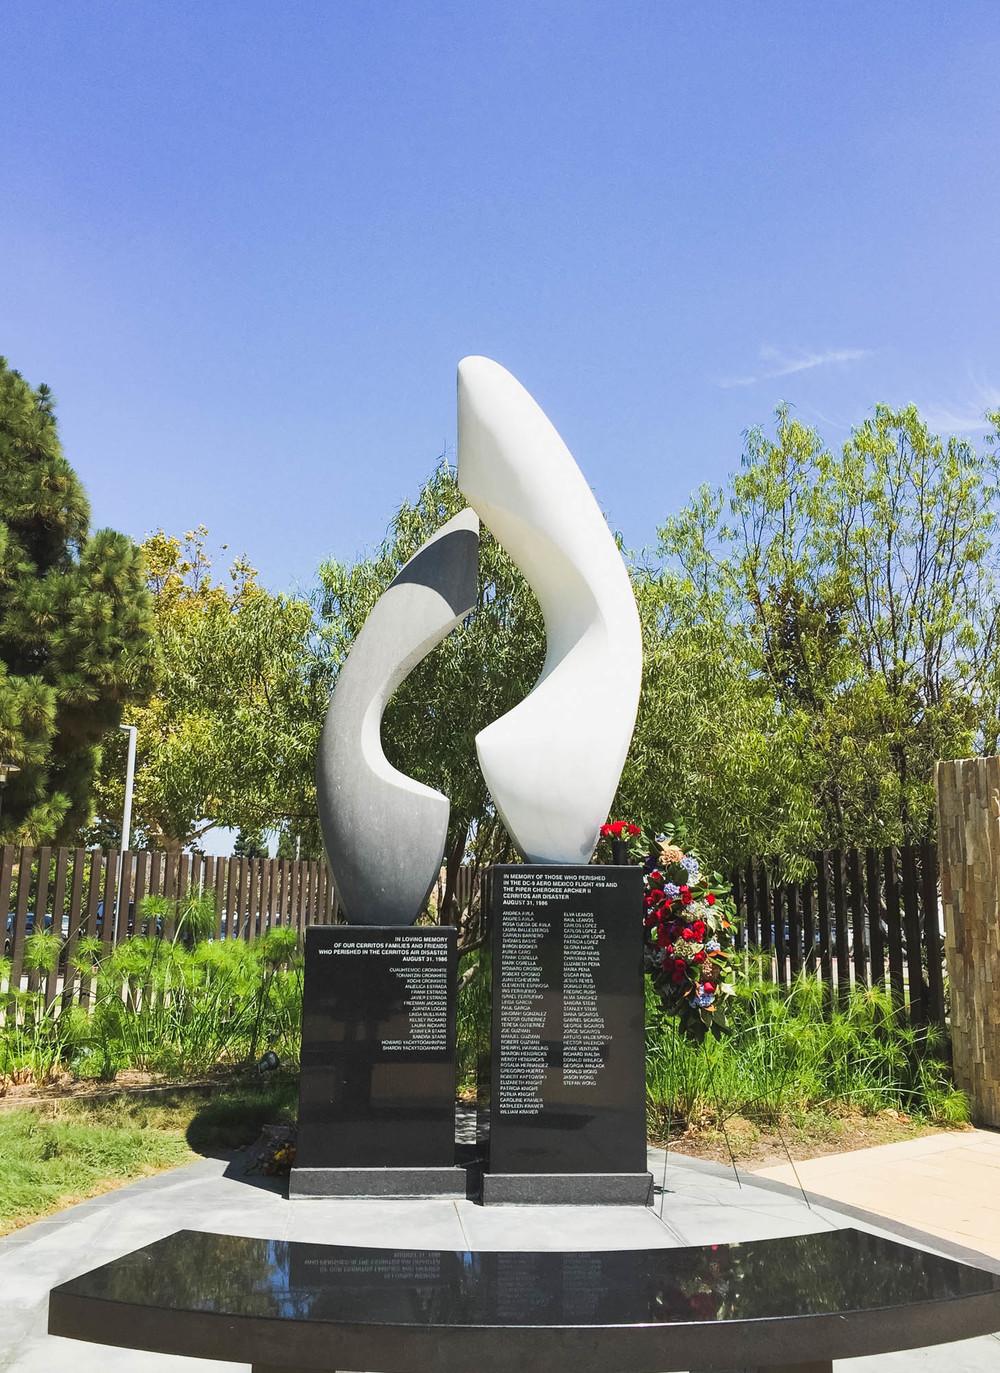 cerritos sculpture garden2.jpg